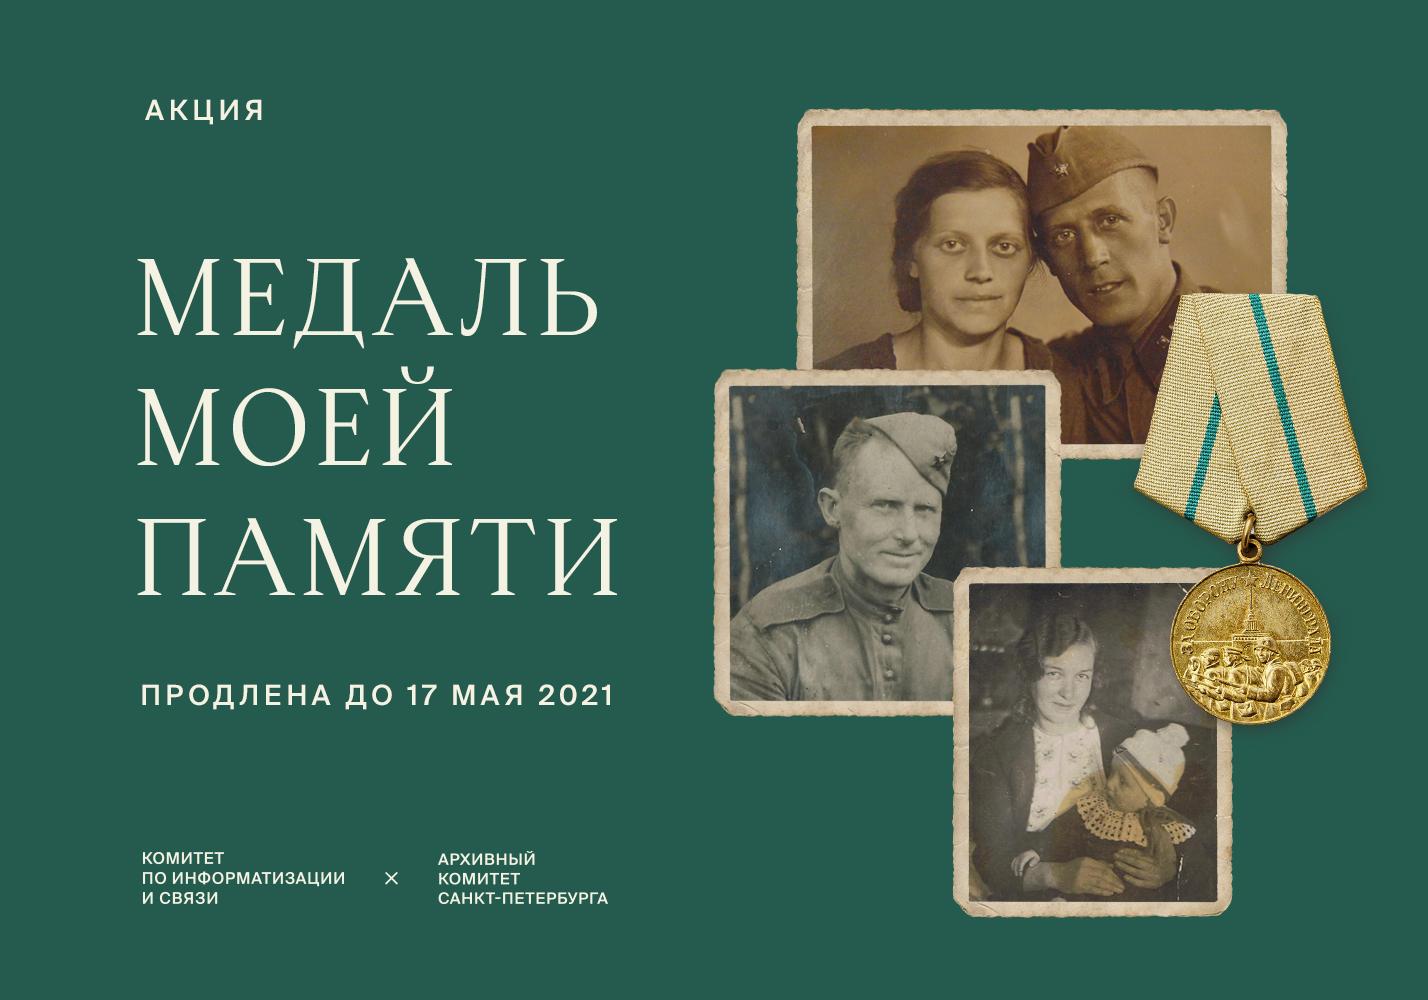 Акция «Медаль моей памяти» продлена до 17 мая 2021 года